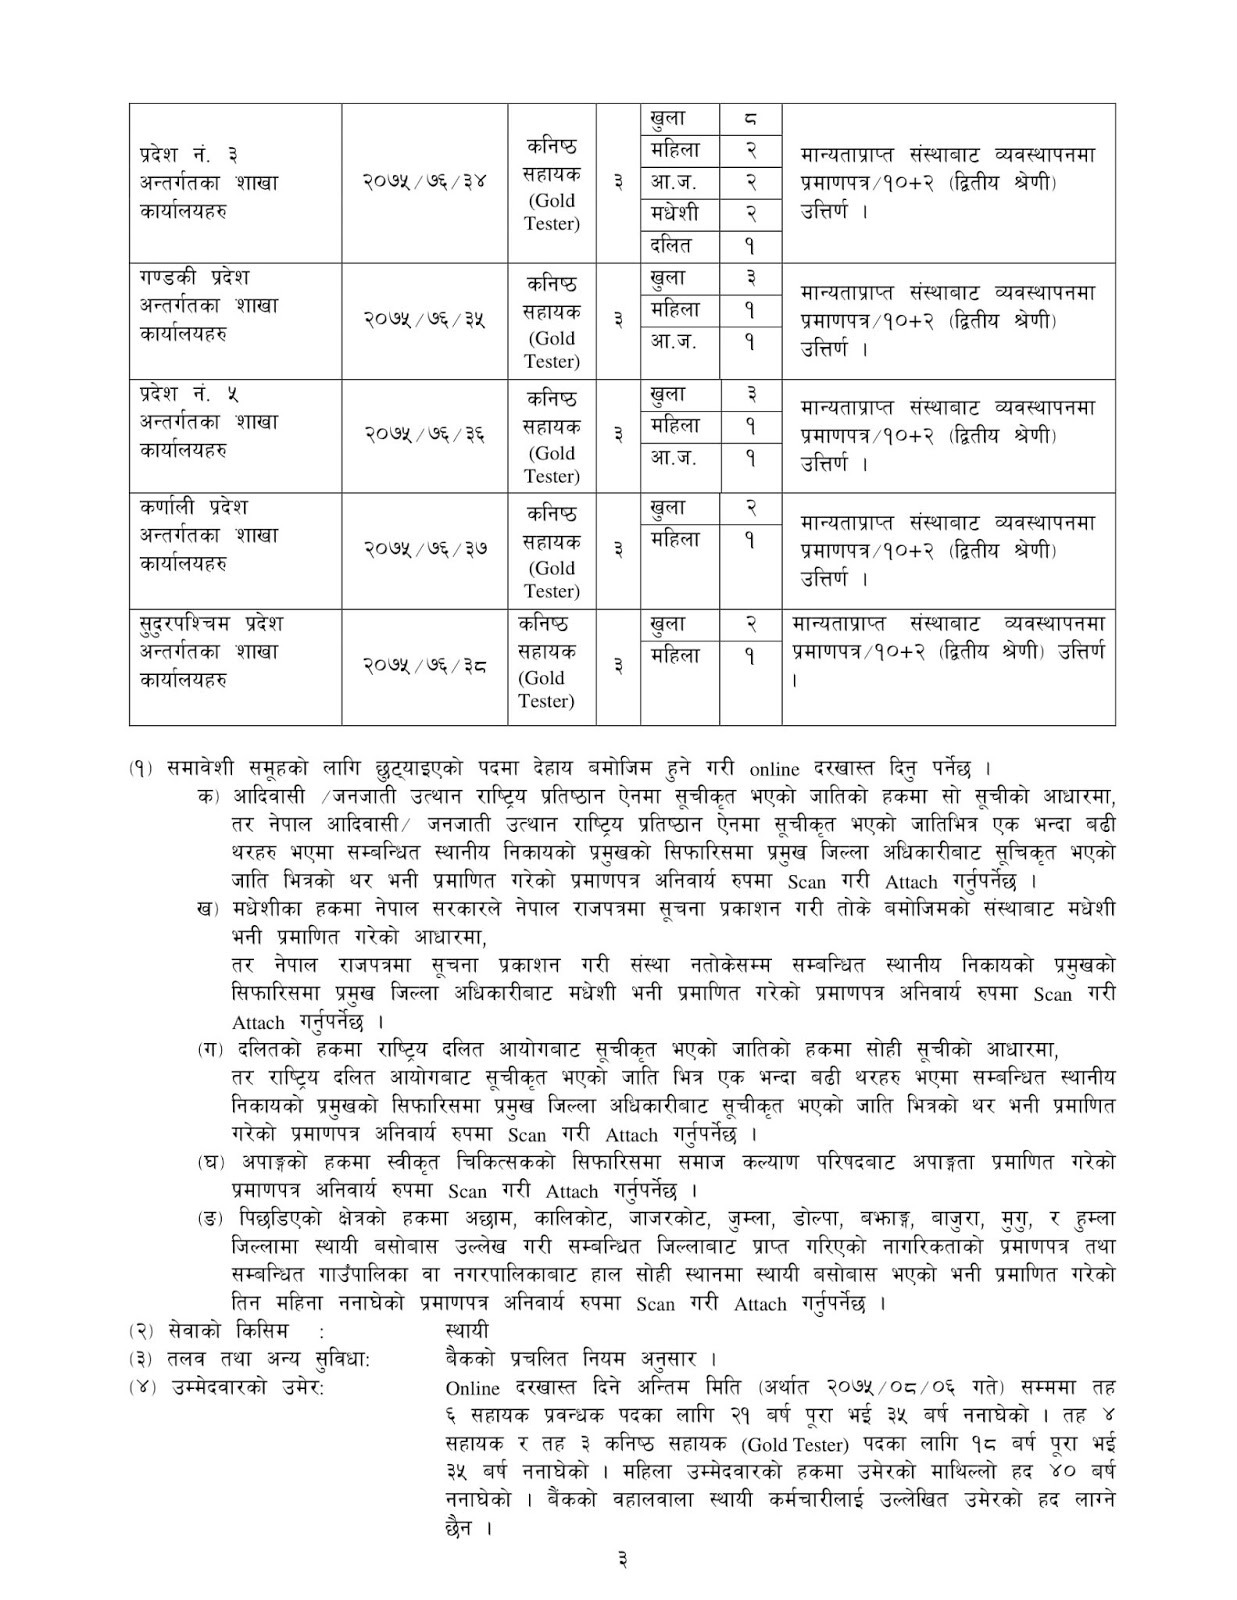 Nepal Bank Limited Announced Various Vacancies